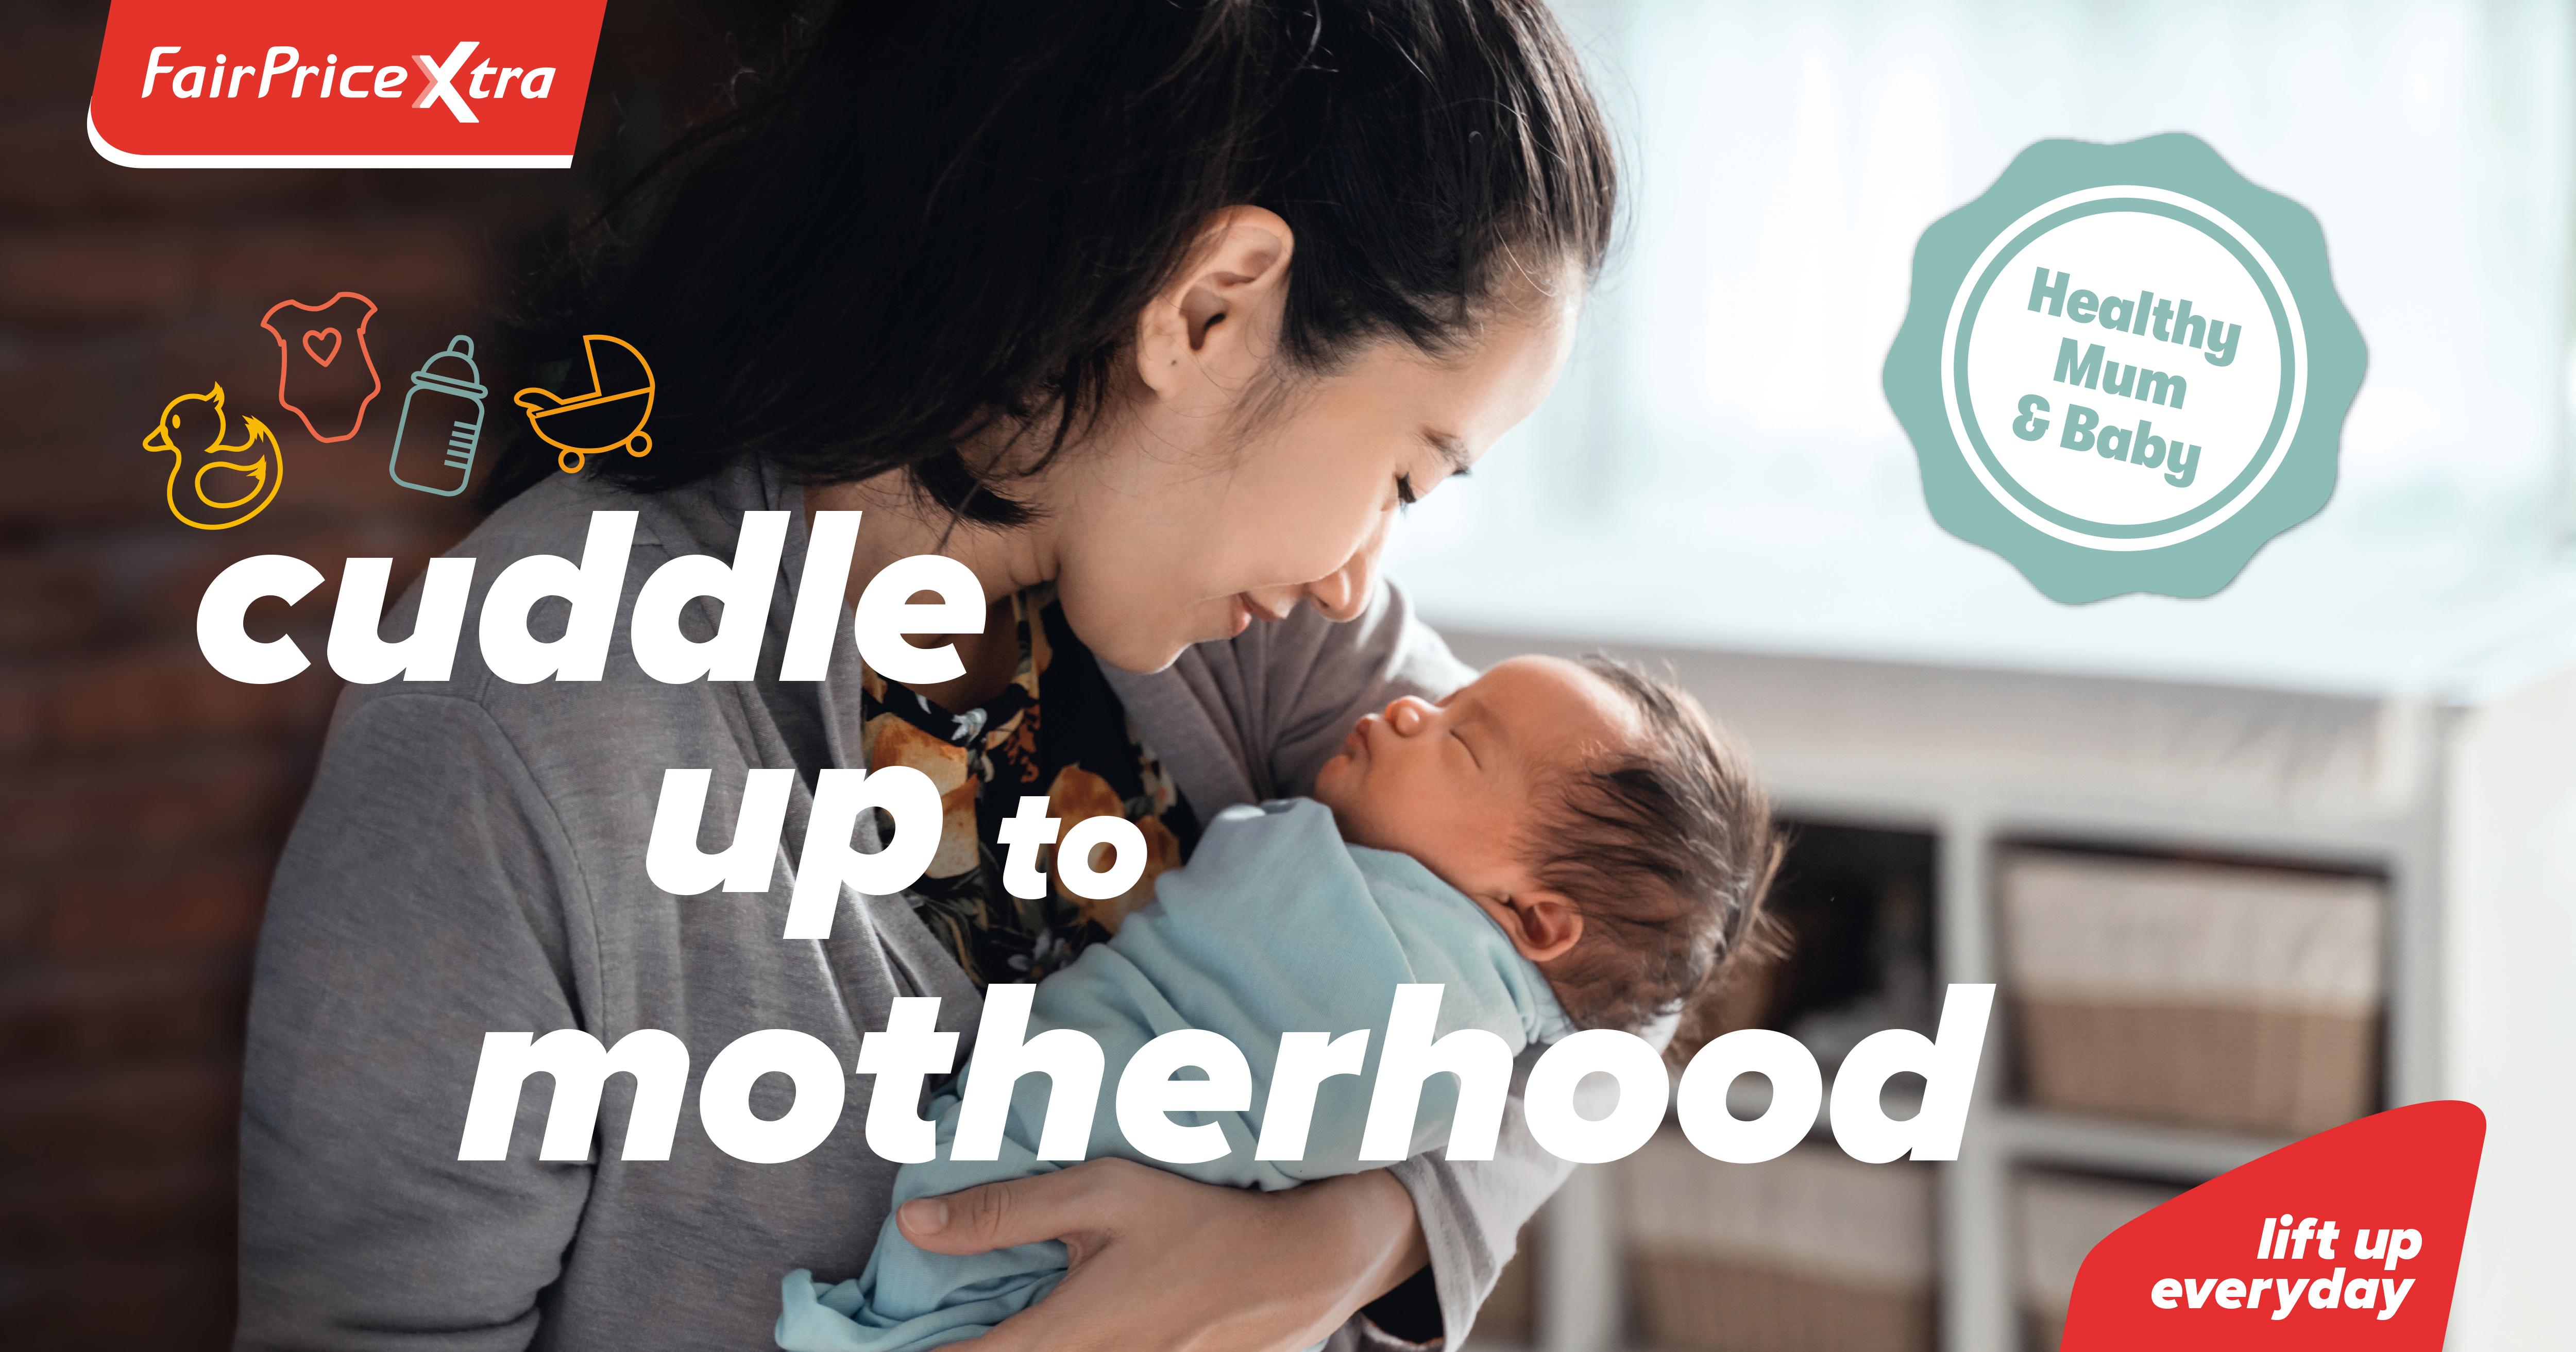 Cuddle up to motherhood with up to 35% savings at FairPrice Xtra's Mum & Baby Fair till 7 April 2021